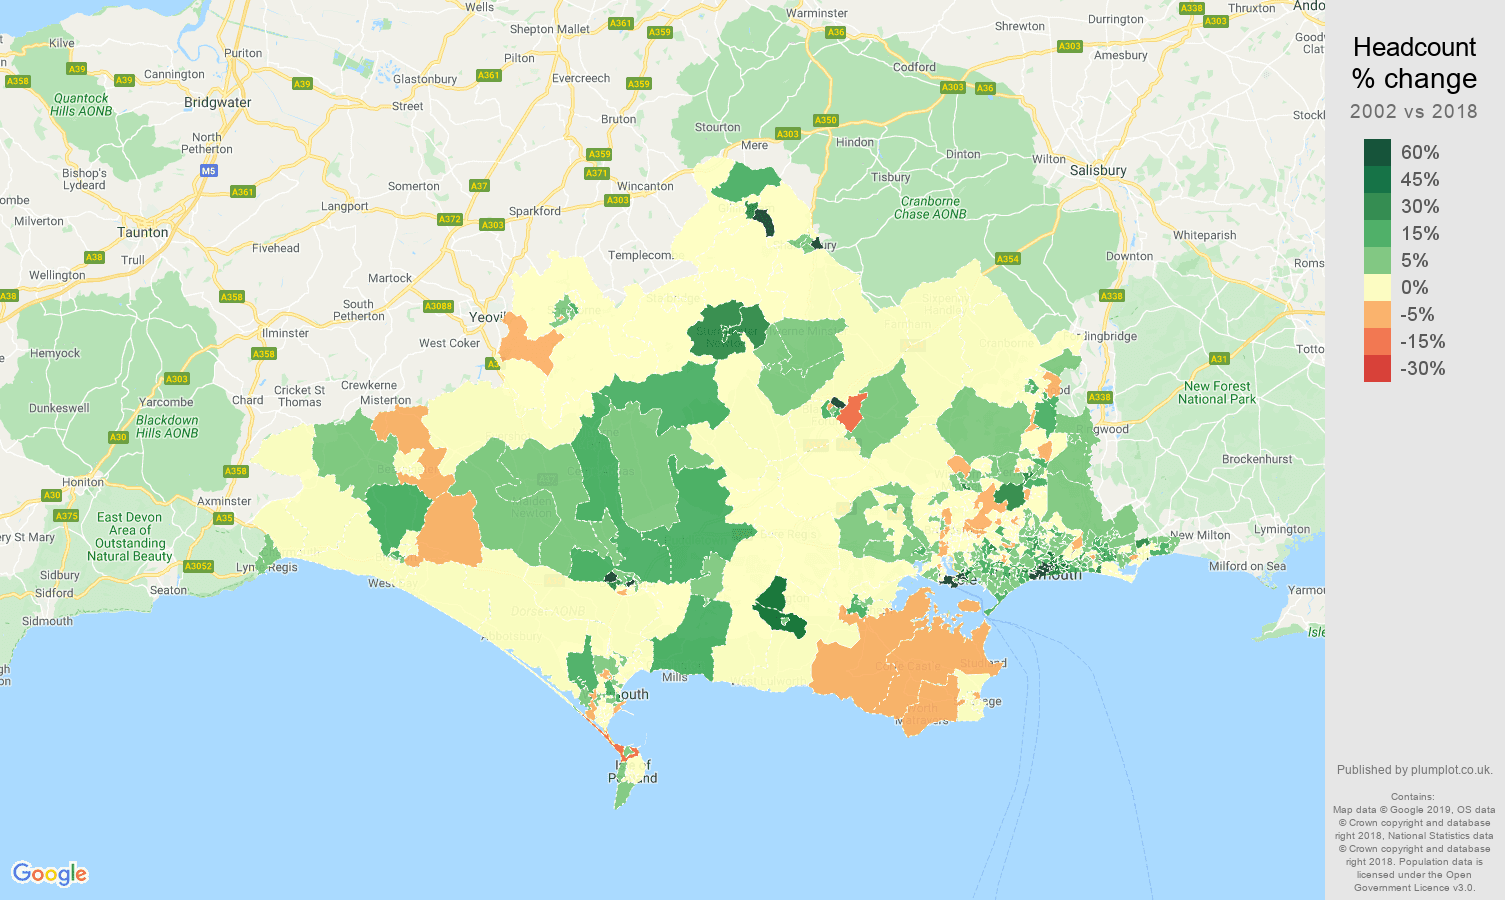 Dorset headcount change map